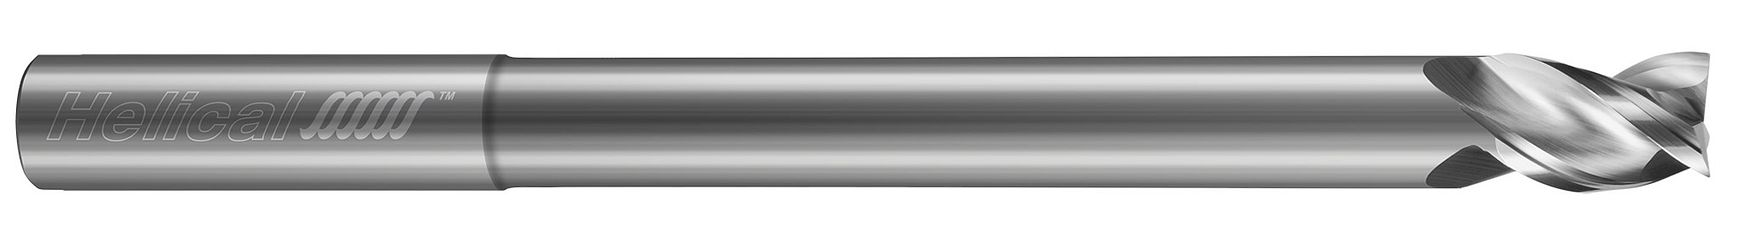 tool-details-46245